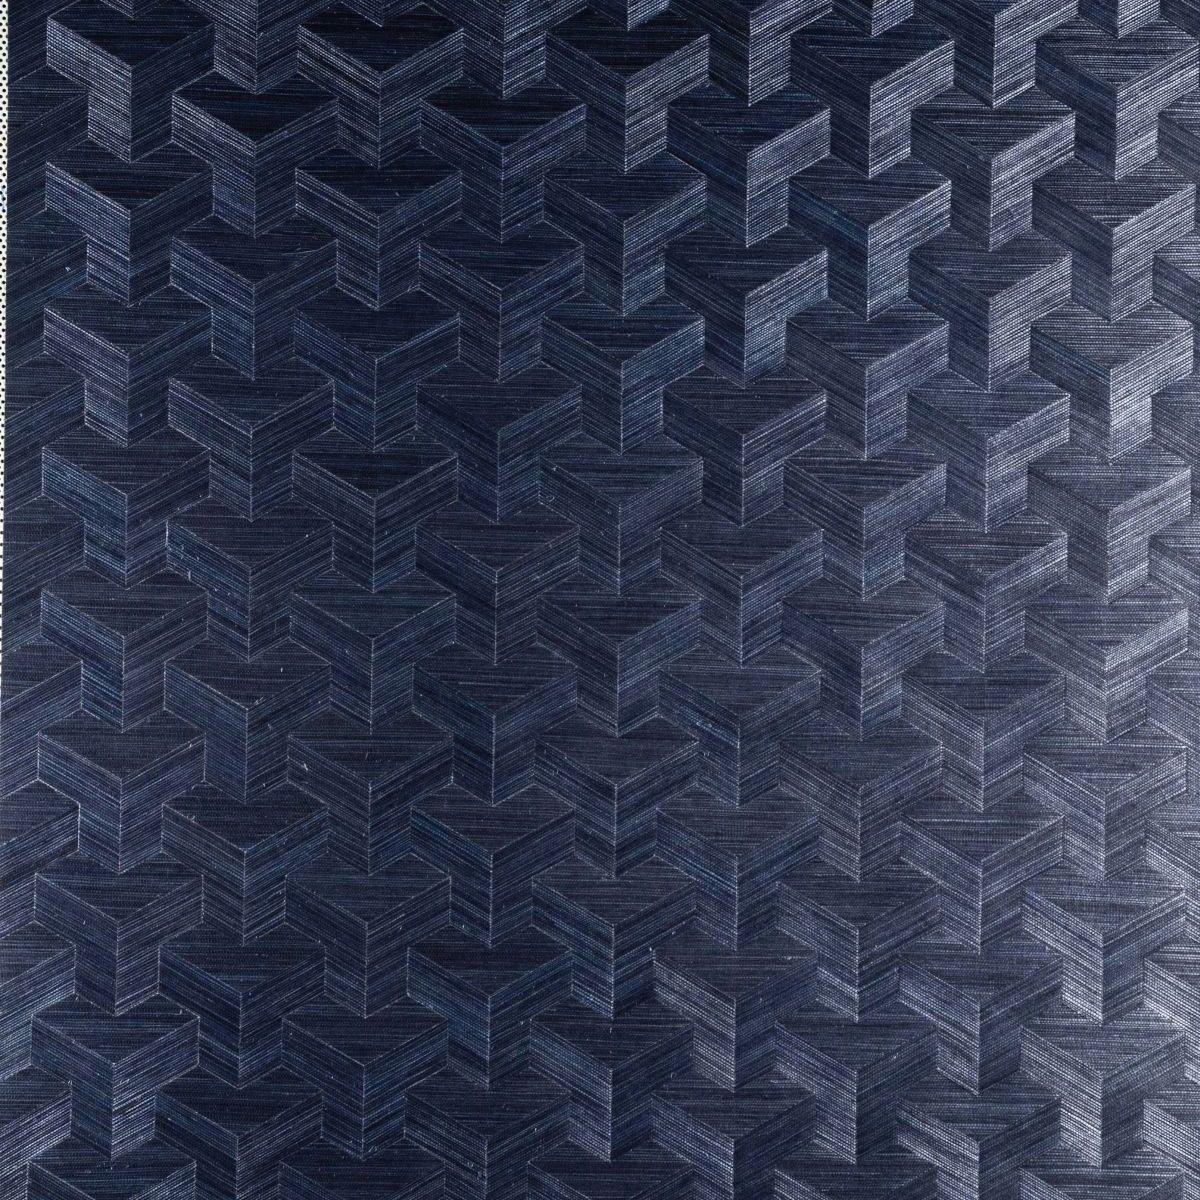 hochwertige tapeten und stoffe vlies sisal tapete cube dunkelblau 49002 kollektion heliodor. Black Bedroom Furniture Sets. Home Design Ideas